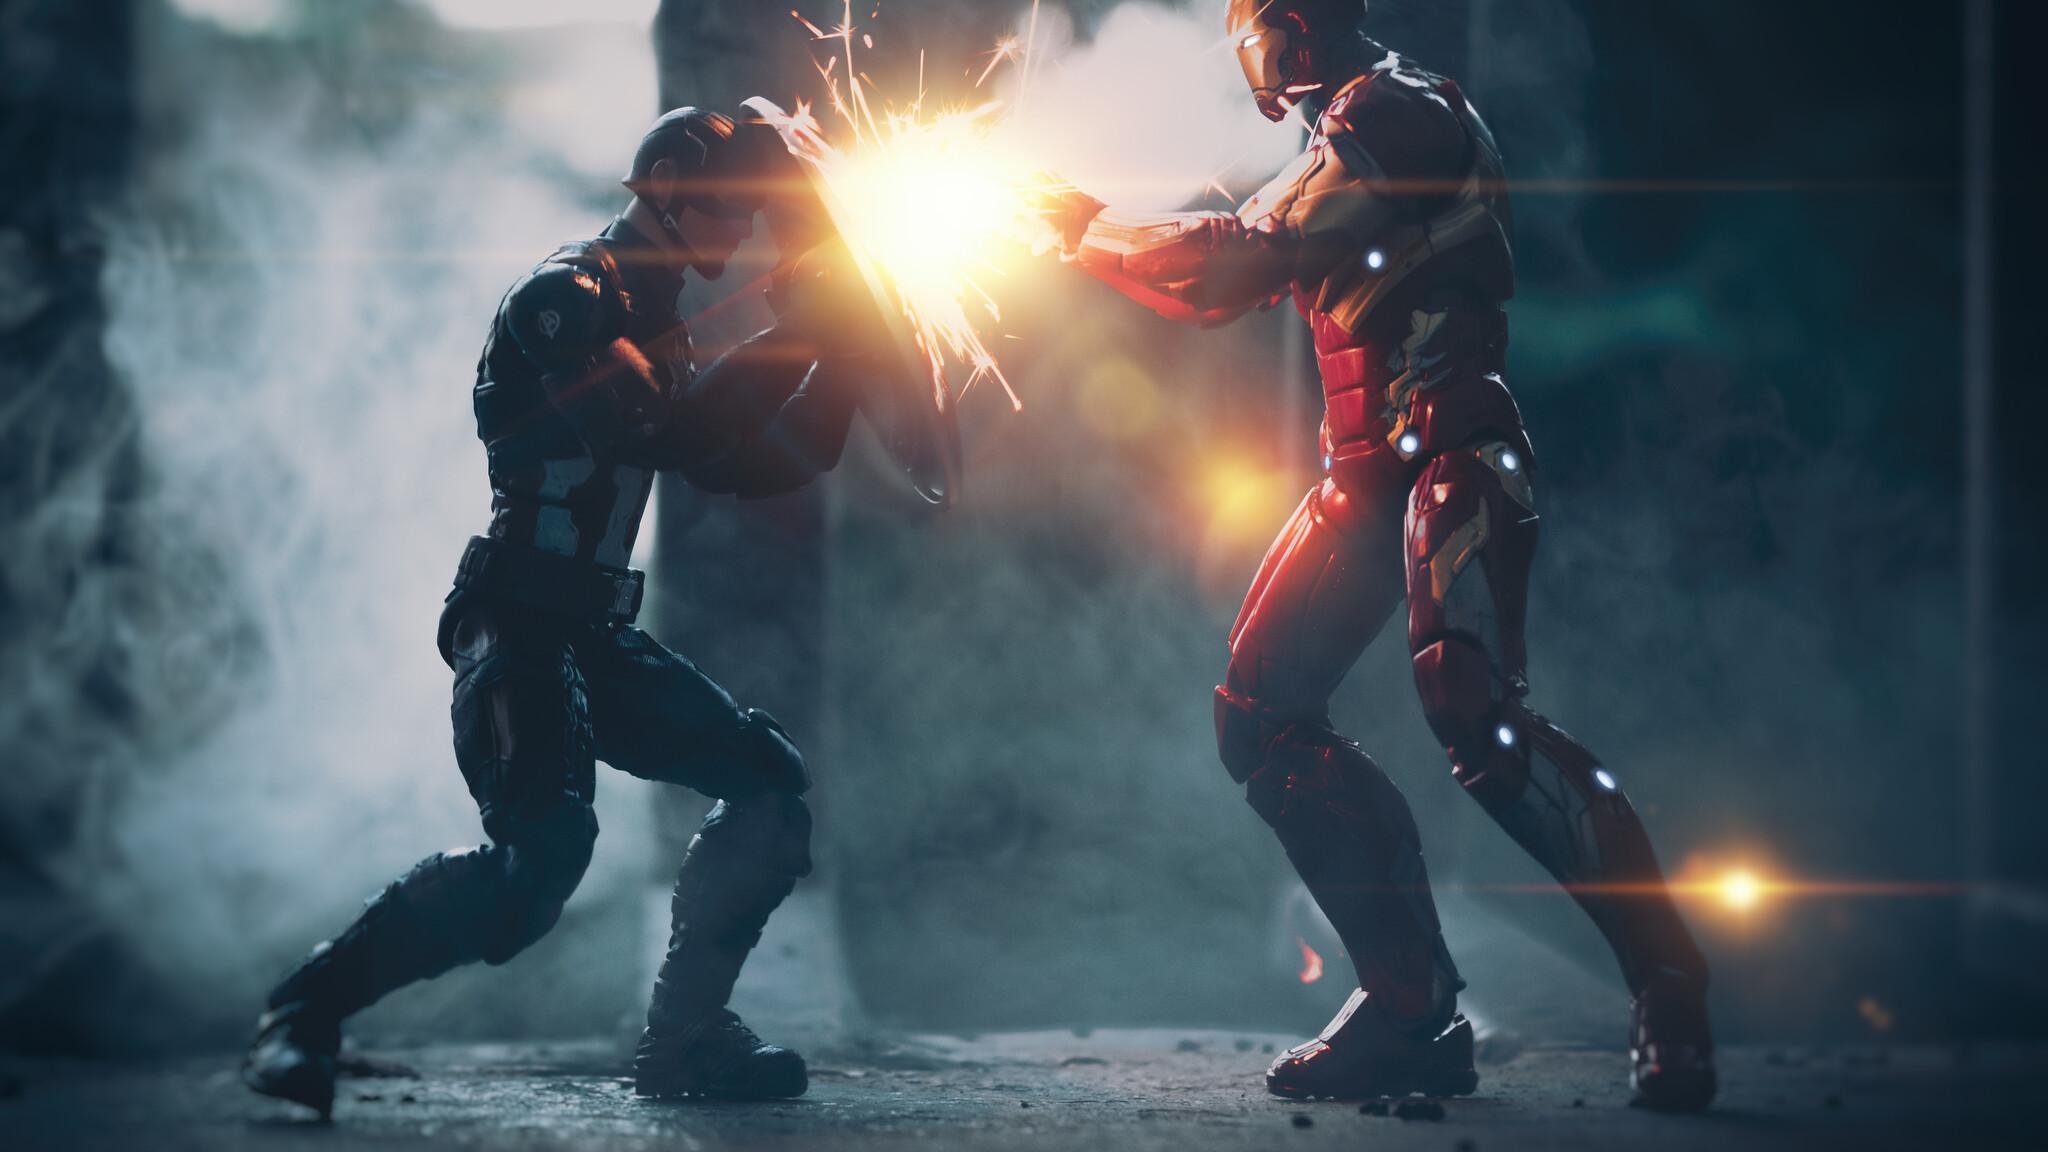 2048x1152 Captain America Vs Iron Man Artwork 5k 2048x1152